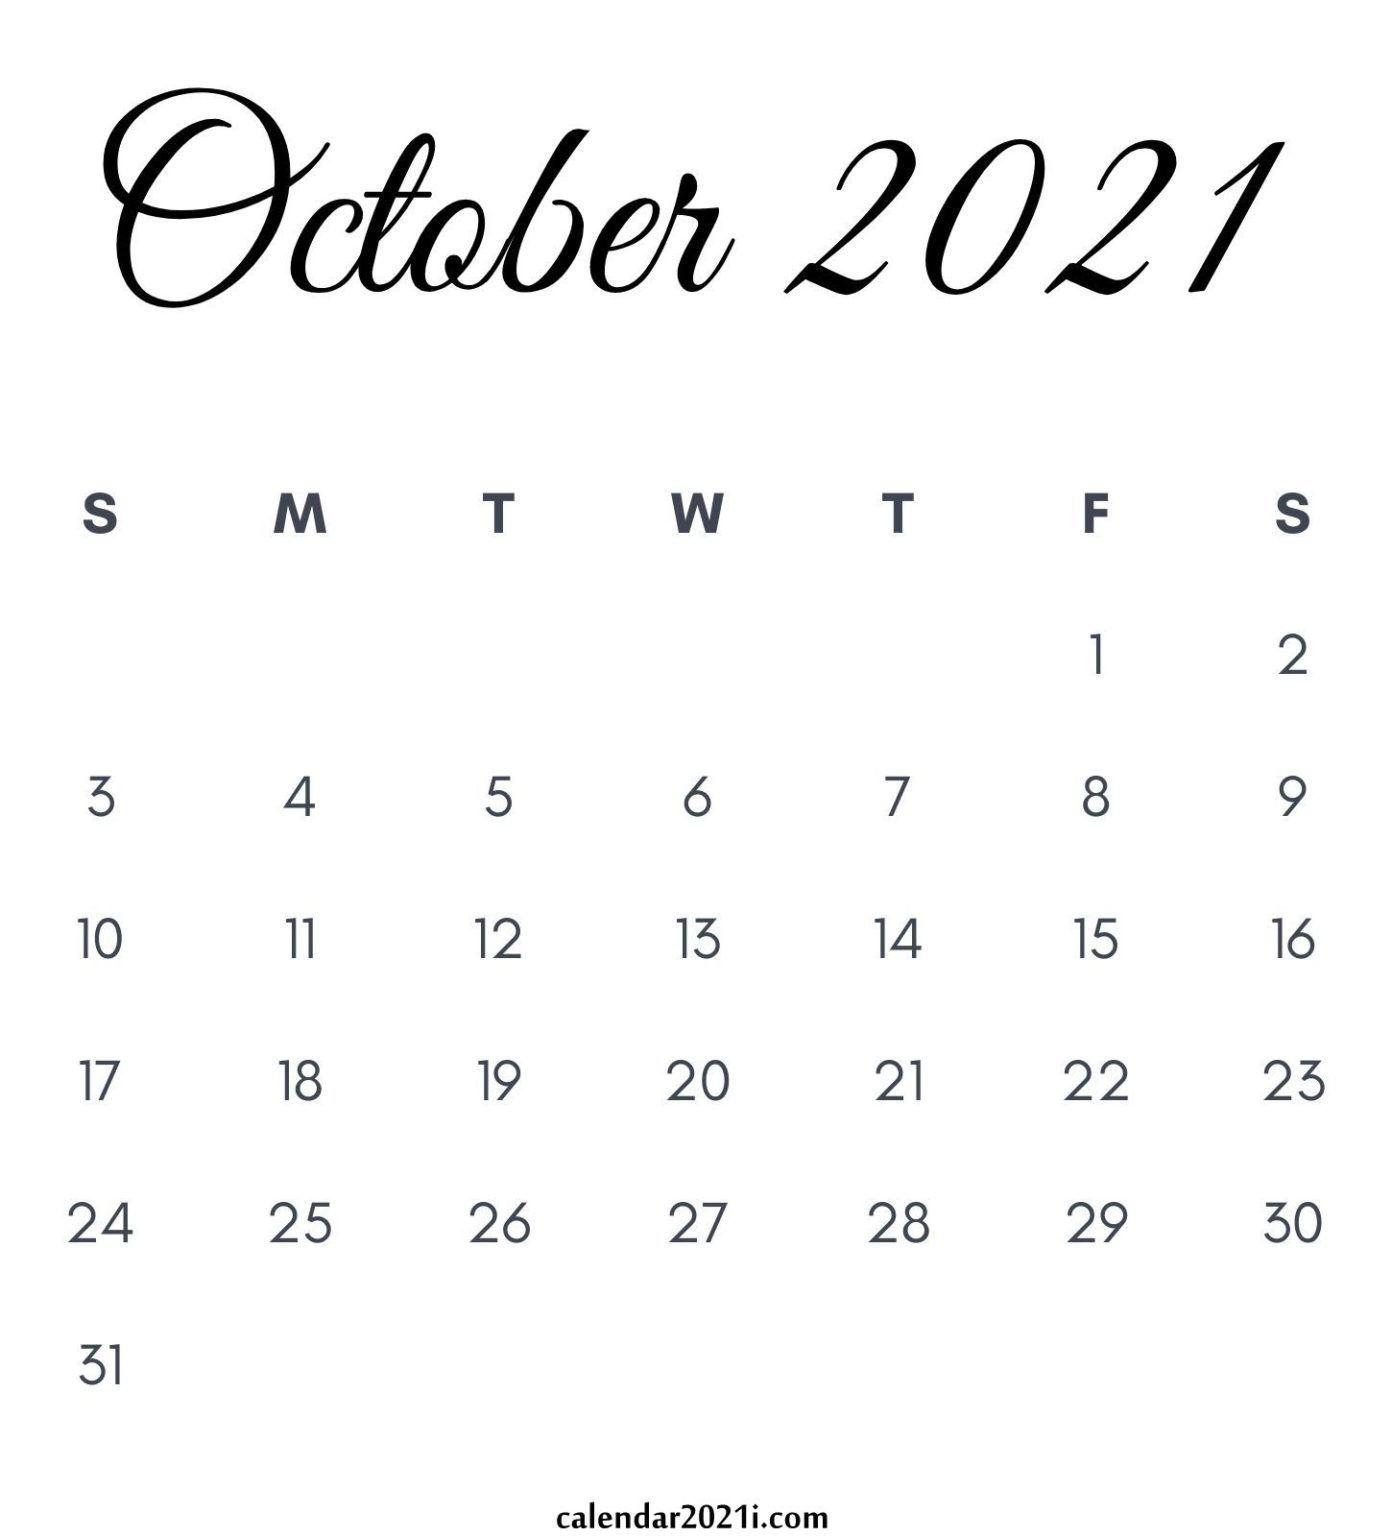 October 2021 Calendar Printable | Monthly calendar printable, 2021